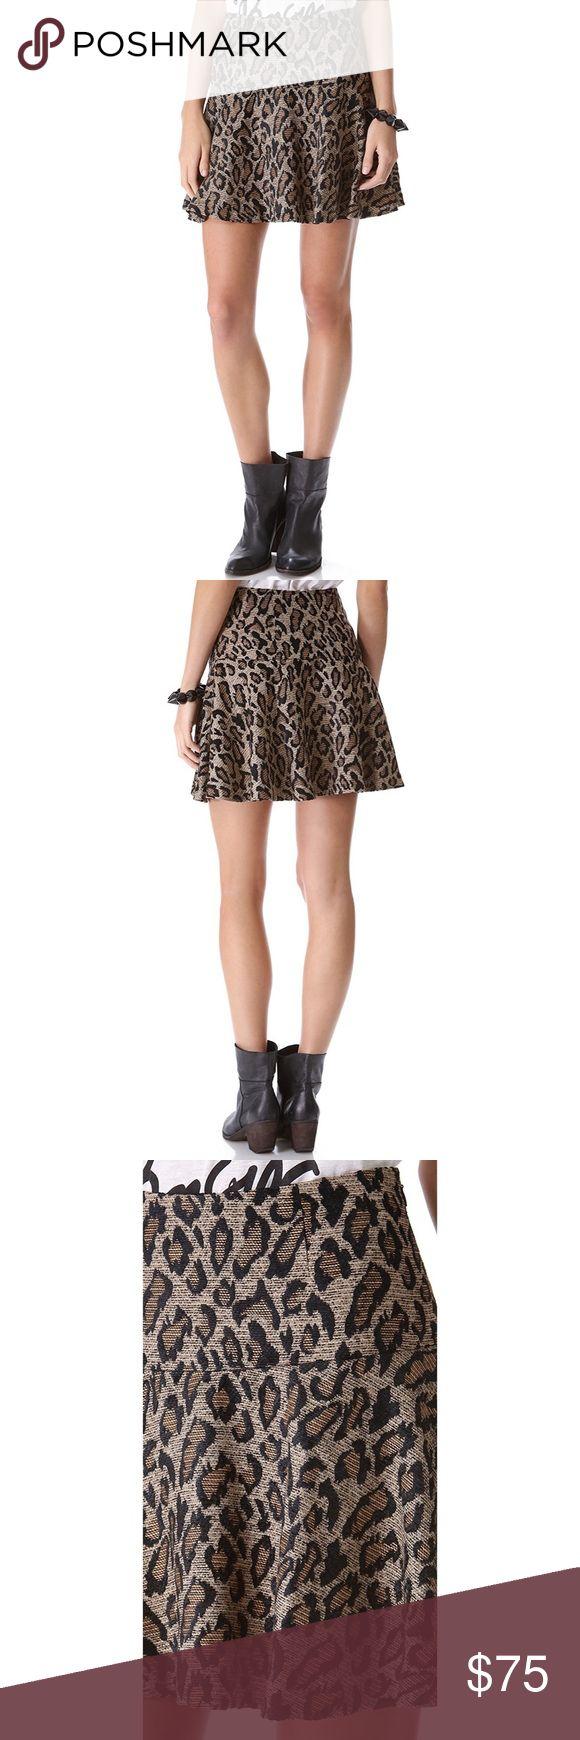 Free People Chenille Cheetah Skirt Free People Chenille Cheetah Skirt Free People Skirts